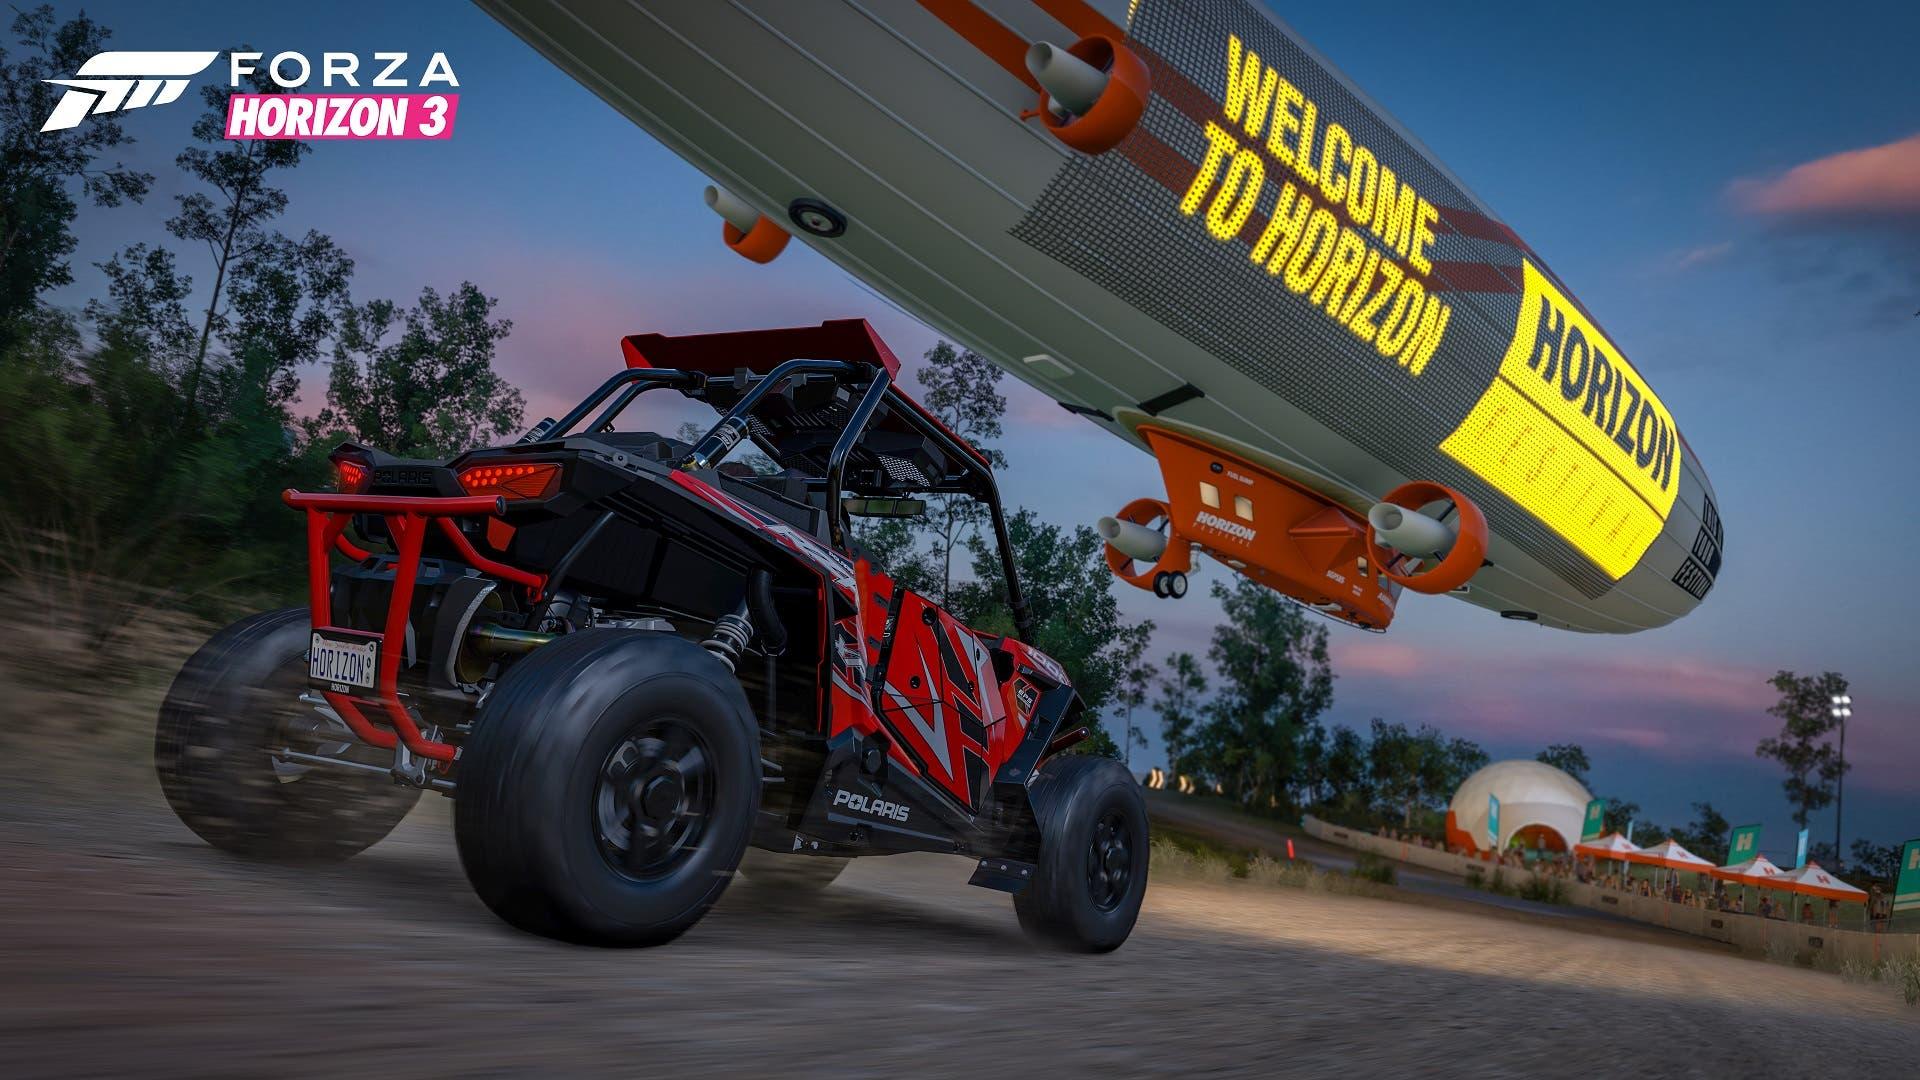 ForzaHorizon3 featured